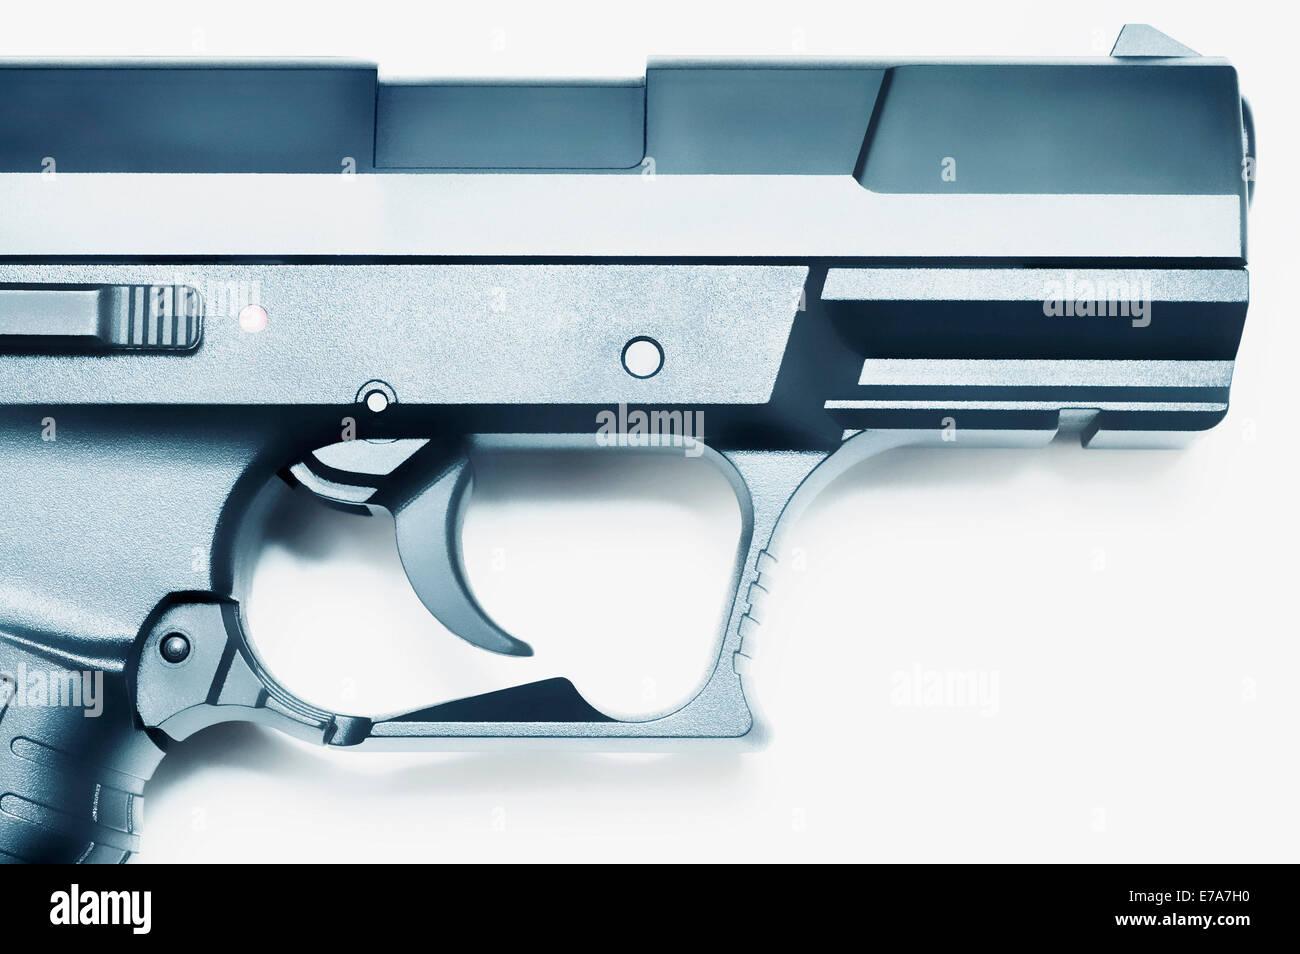 Close-up of trigger and barrel of a handgun - Stock Image